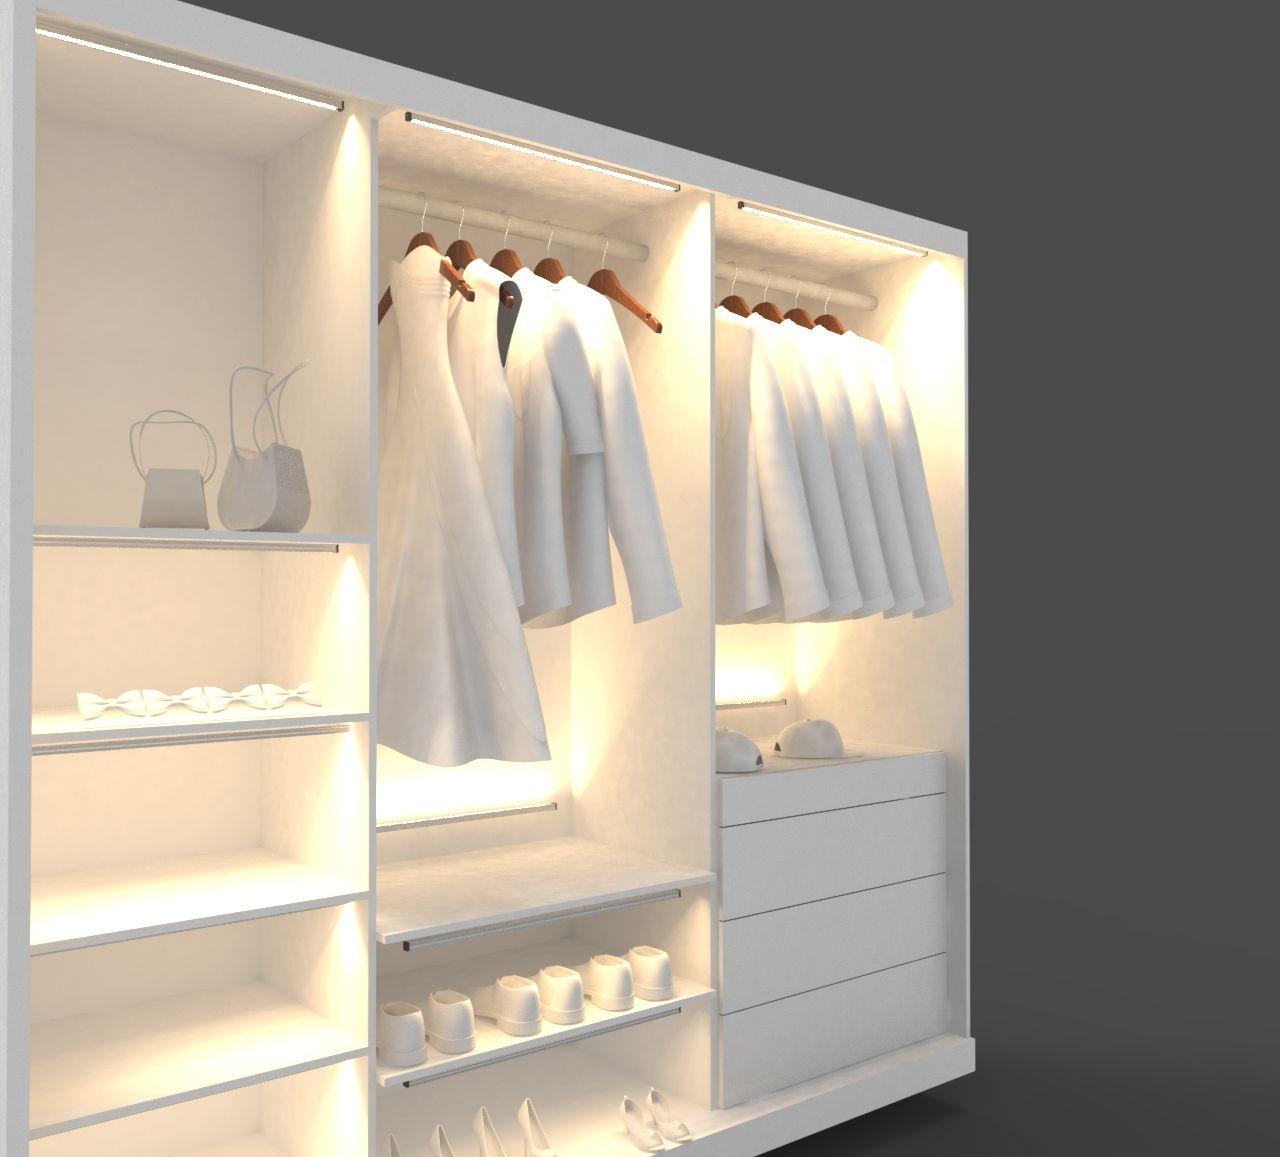 Led Light Fixtures For Closet Begehbarer Kleiderschrank Beleuchtung Begehbarer Kleiderschrank Kleiderschrank